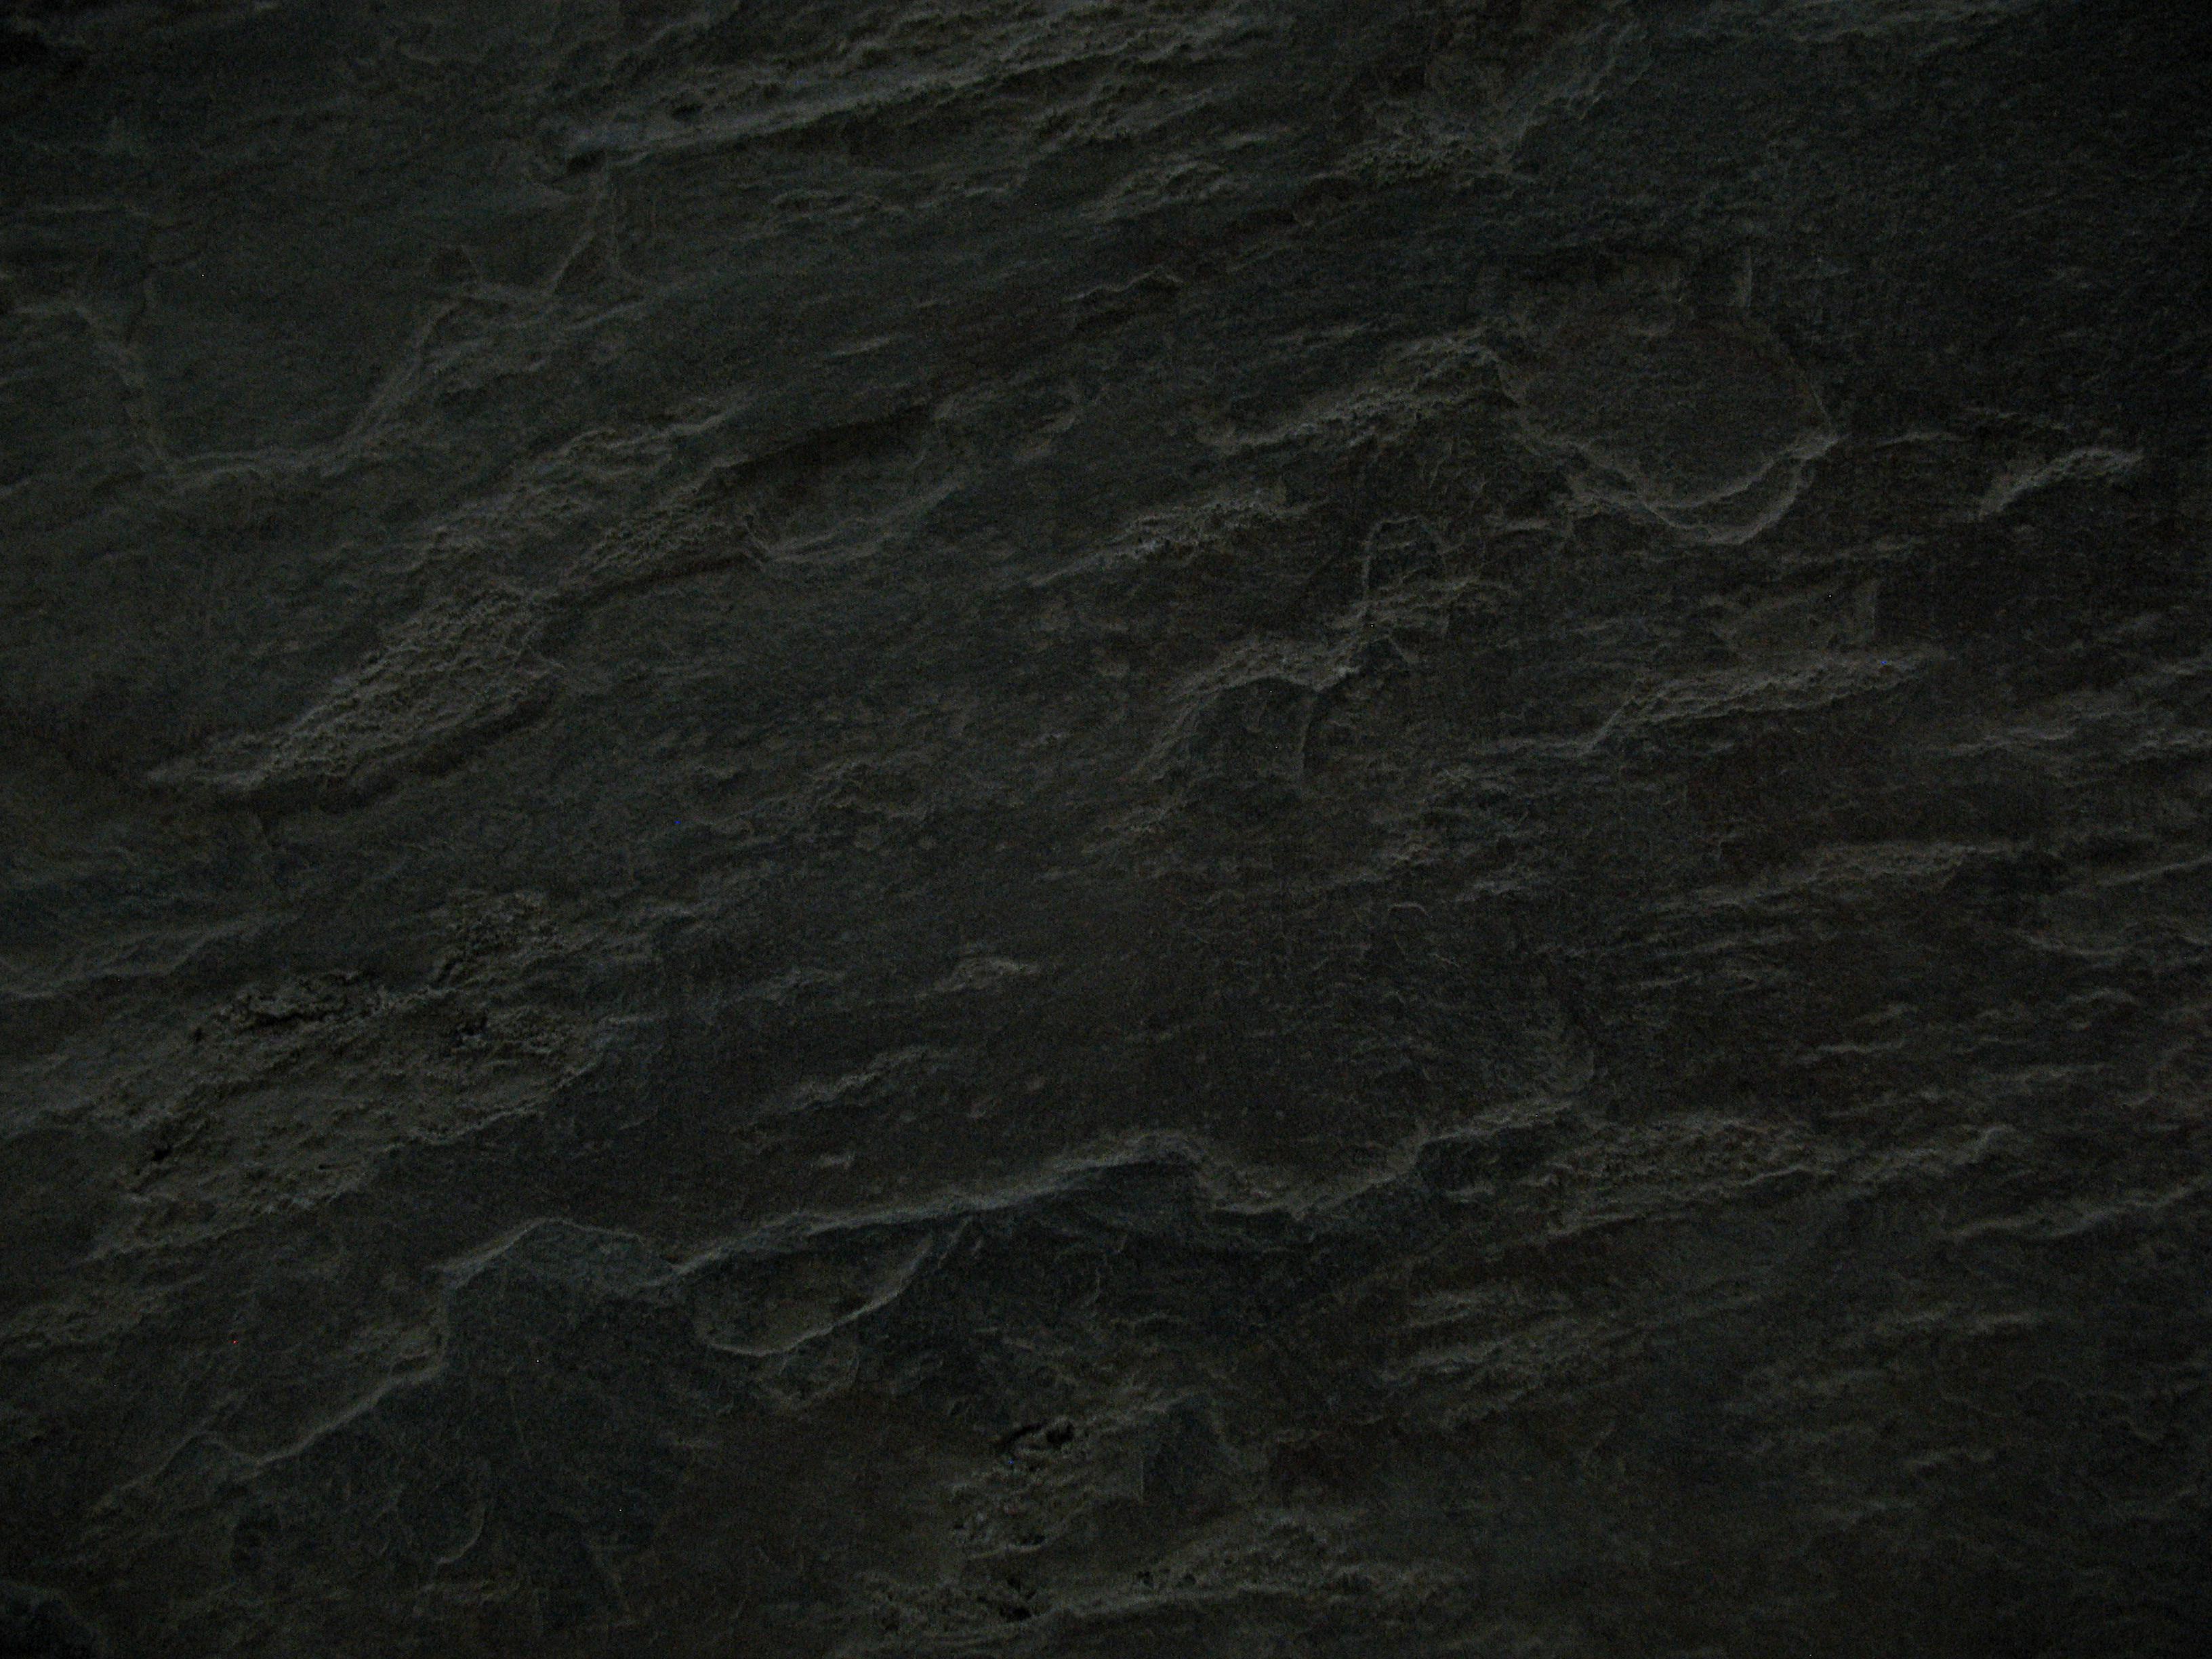 Slate Texture, Dark, Freetexturefrida, Rock, Slate, HQ Photo